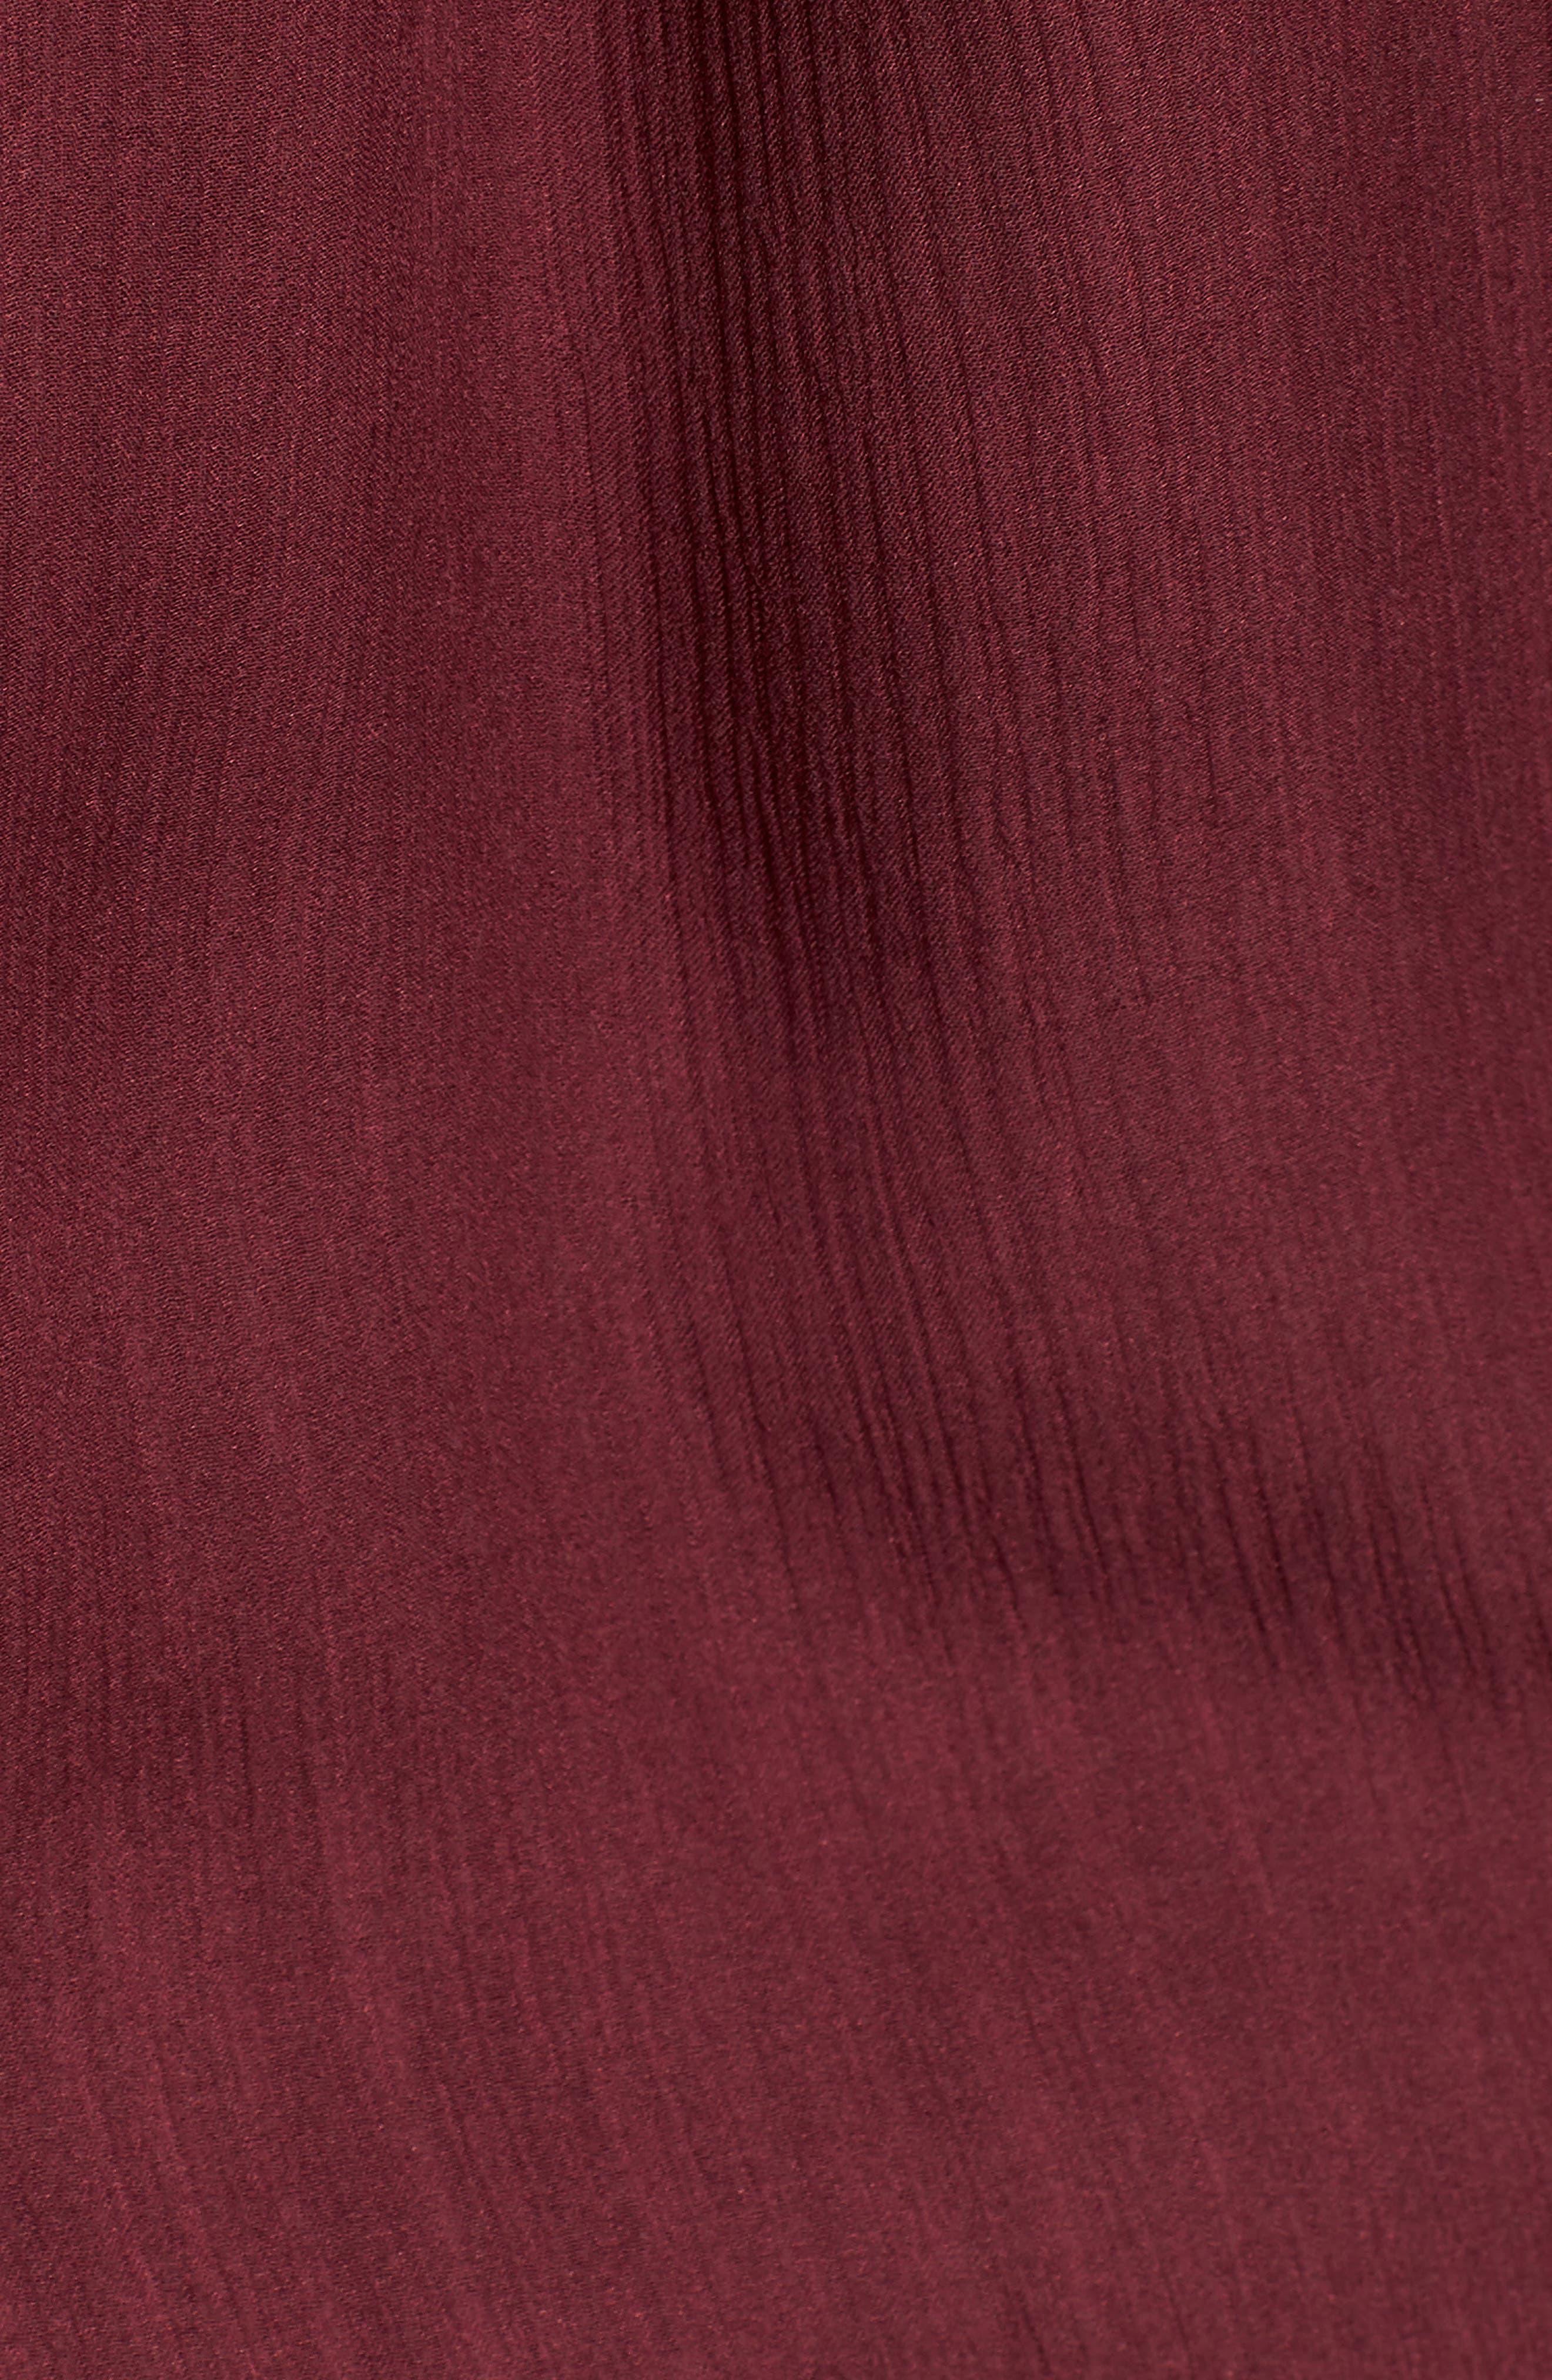 Flutter Sleeve Silk Top,                             Alternate thumbnail 6, color,                             BURGUNDY FIG